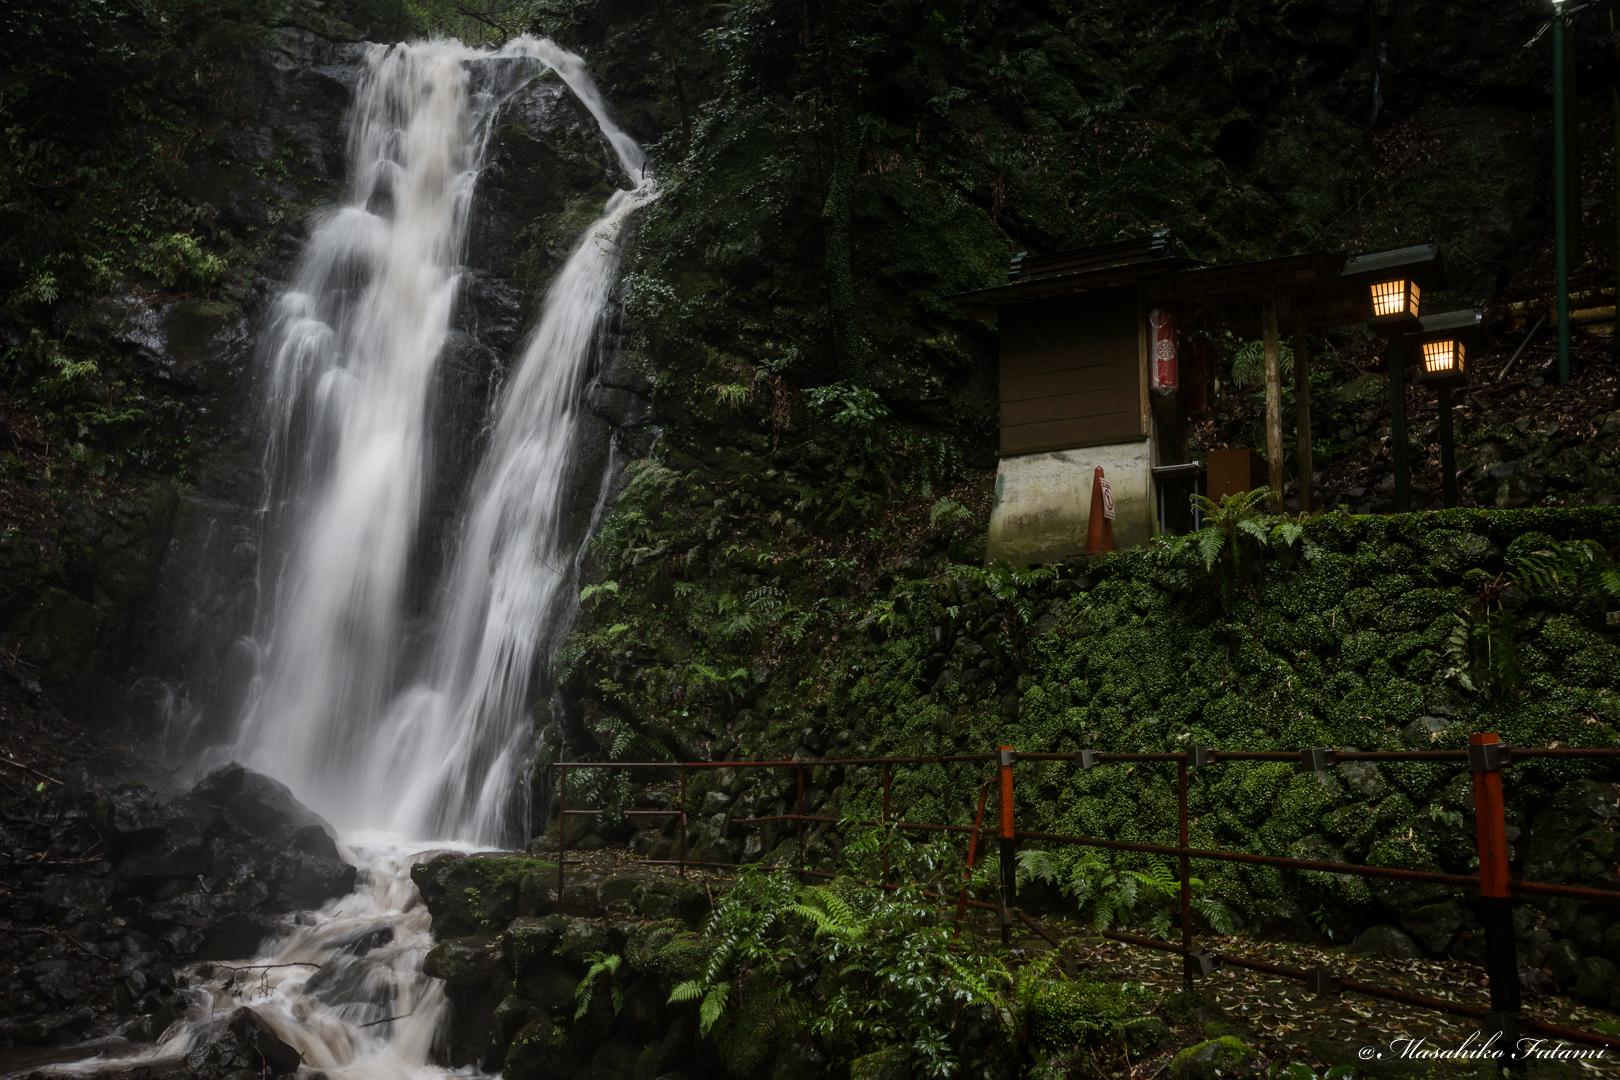 Fudou Waterfall